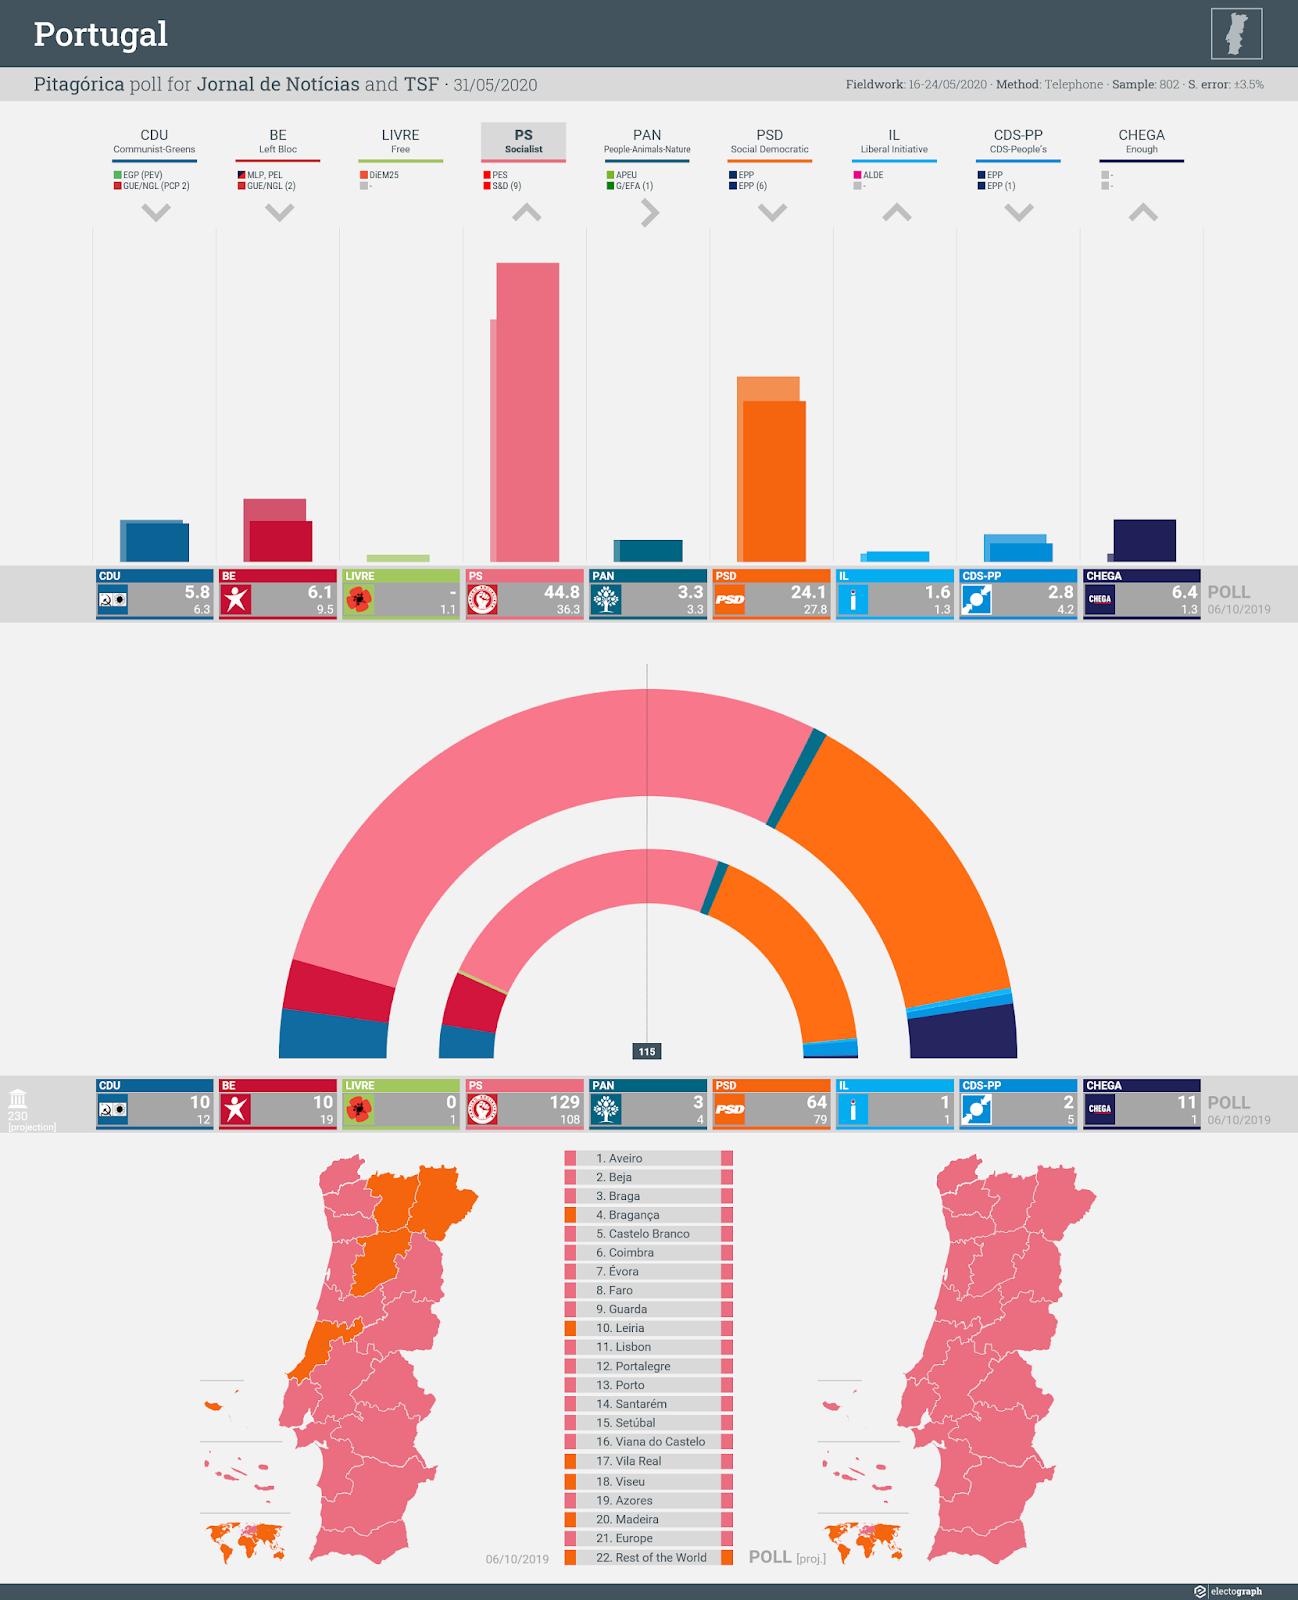 PORTUGAL: Pitagórica poll chart for Jornal de Notícias and TSF, 31 May 2020